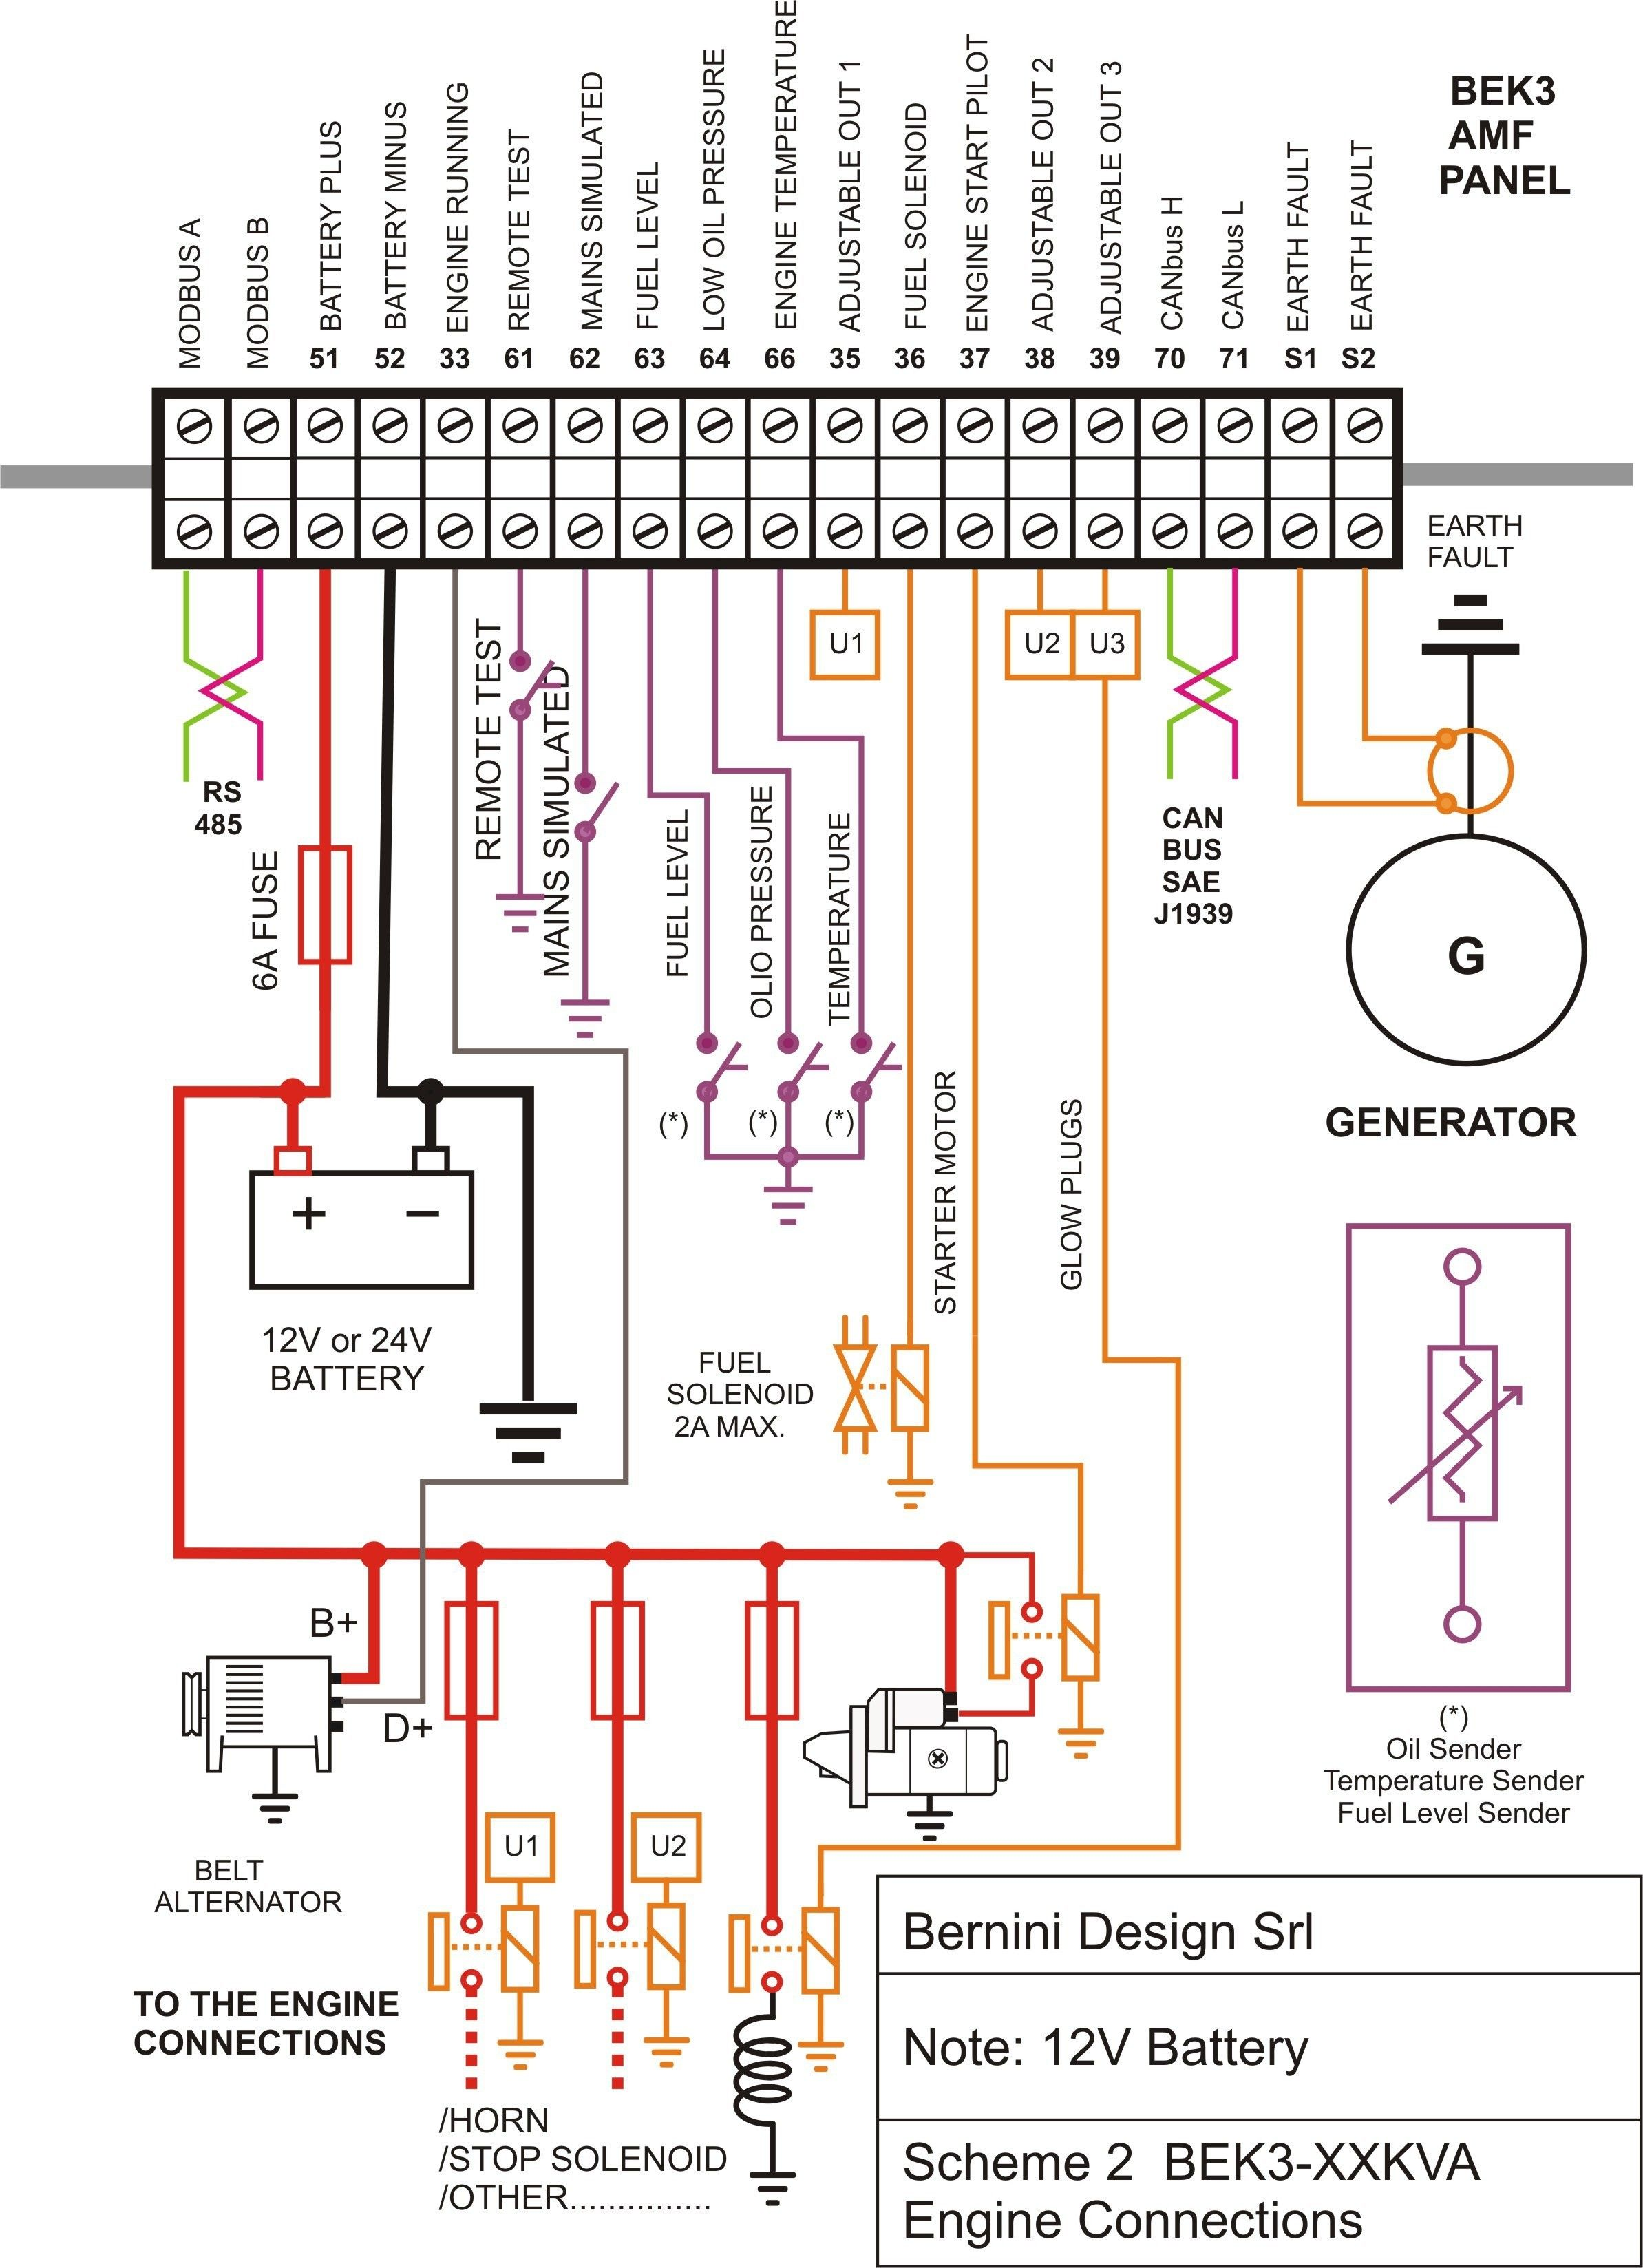 New Wiring Diagram For House Alarm System Diagram Diagramtemplate Diagramsample Control Quadro Elettrico